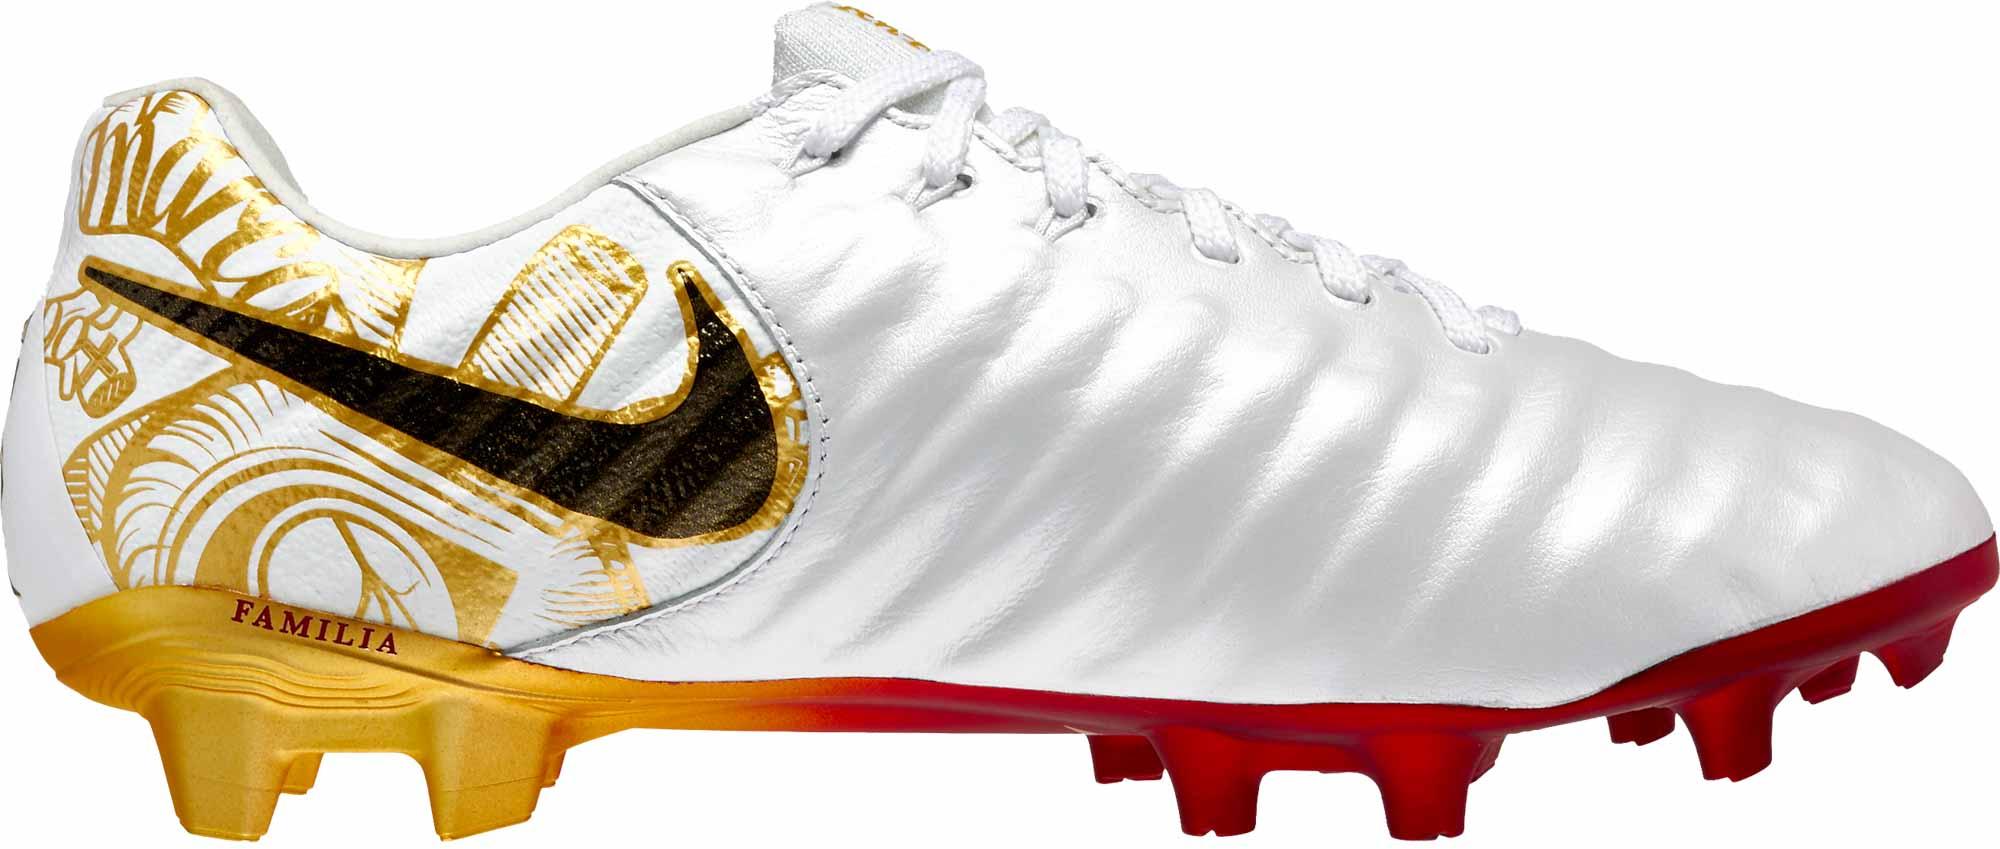 quality design 0c9c4 7d1c4 Nike Tiempo Legend VII SE FG - Sergio Ramos - White ...